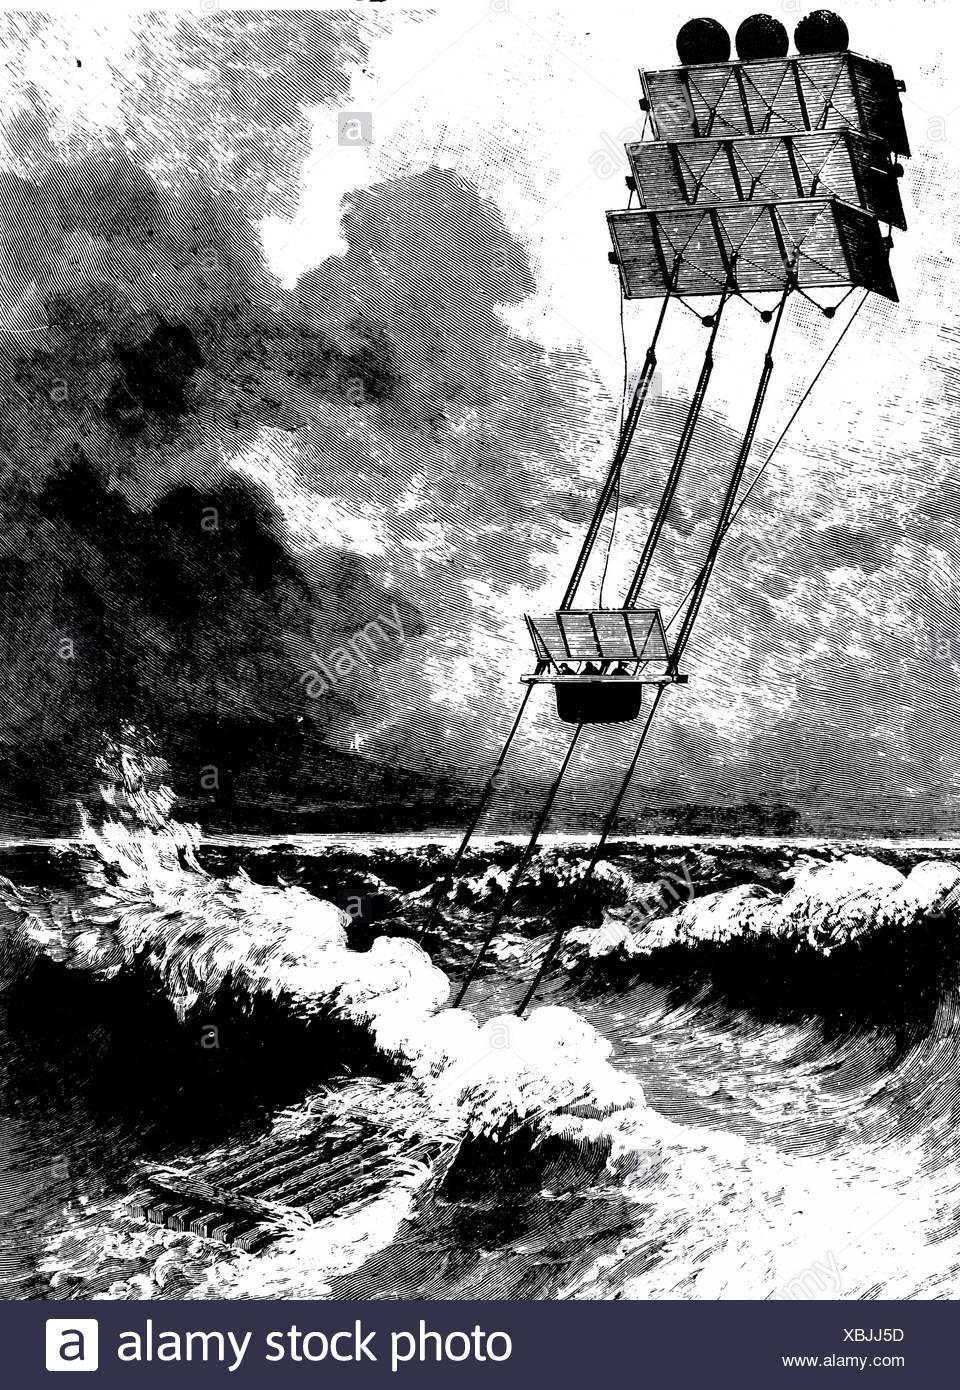 Thayer s Aerial Apparatus, 1890 - Stock Image